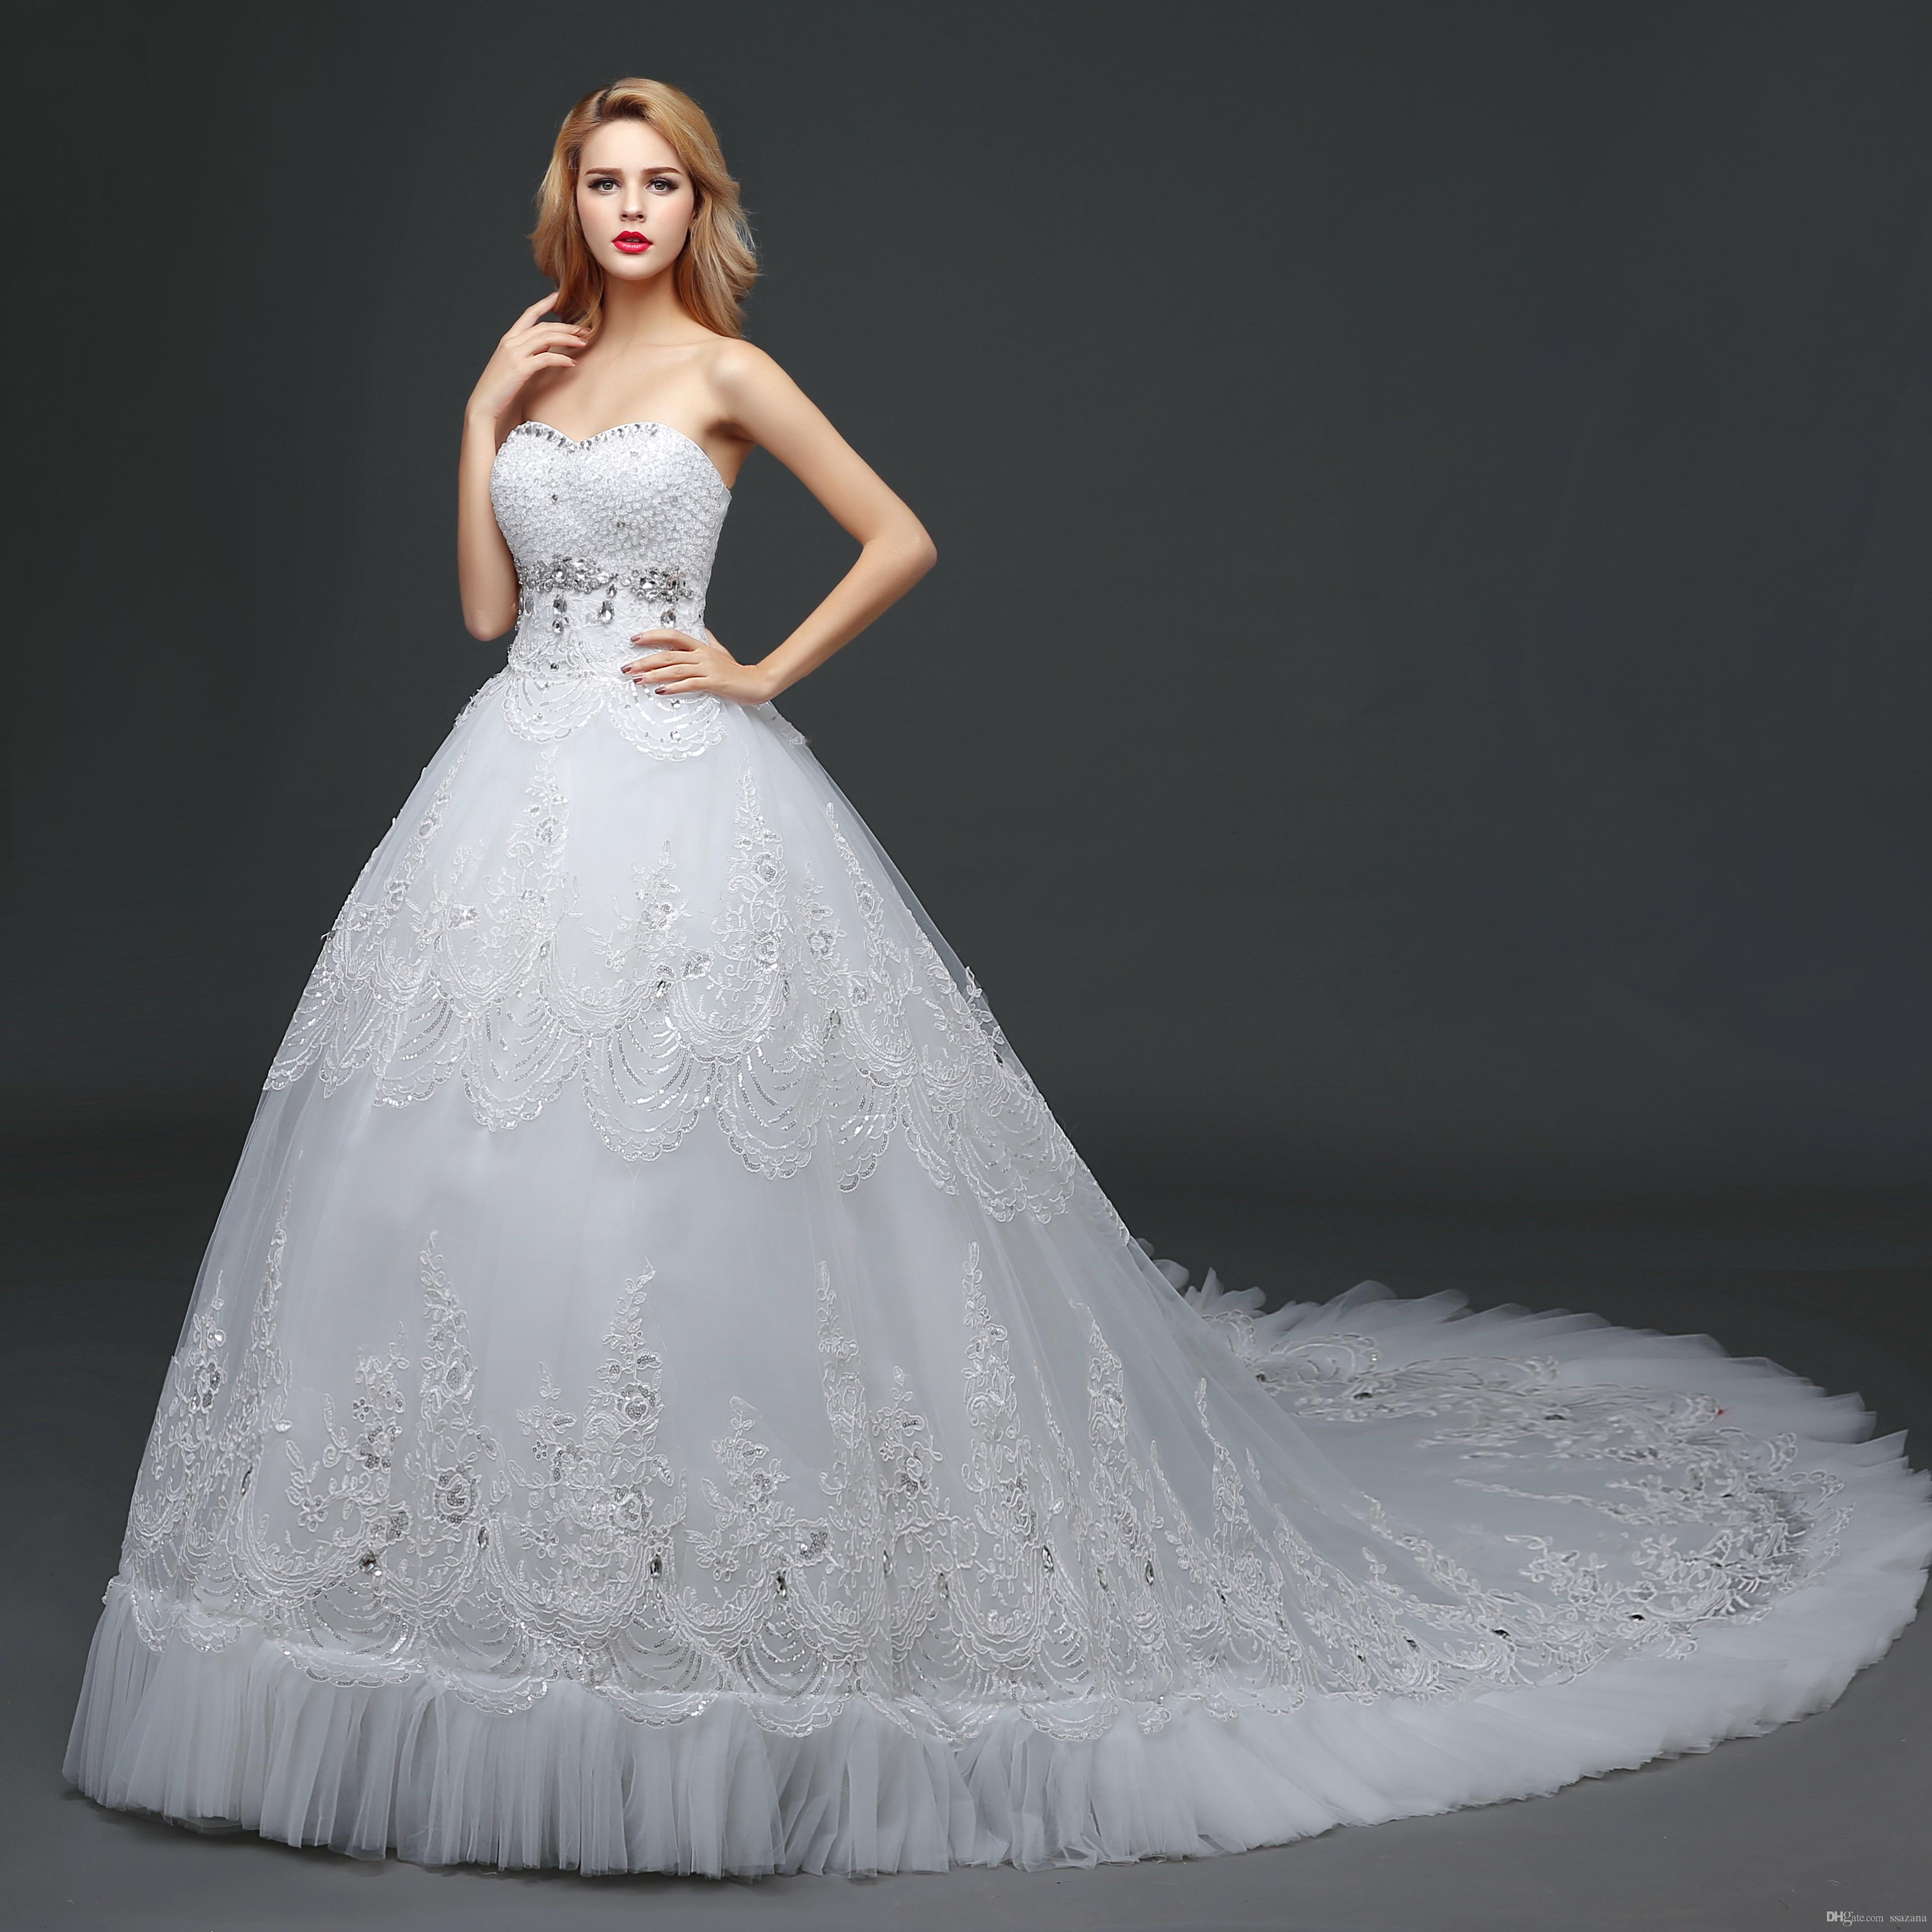 Long Tail Wedding Dresses Beautiful Crystal Print Sequins Mermaid Wedding Dress Robes De Soiree De Mariee Plus